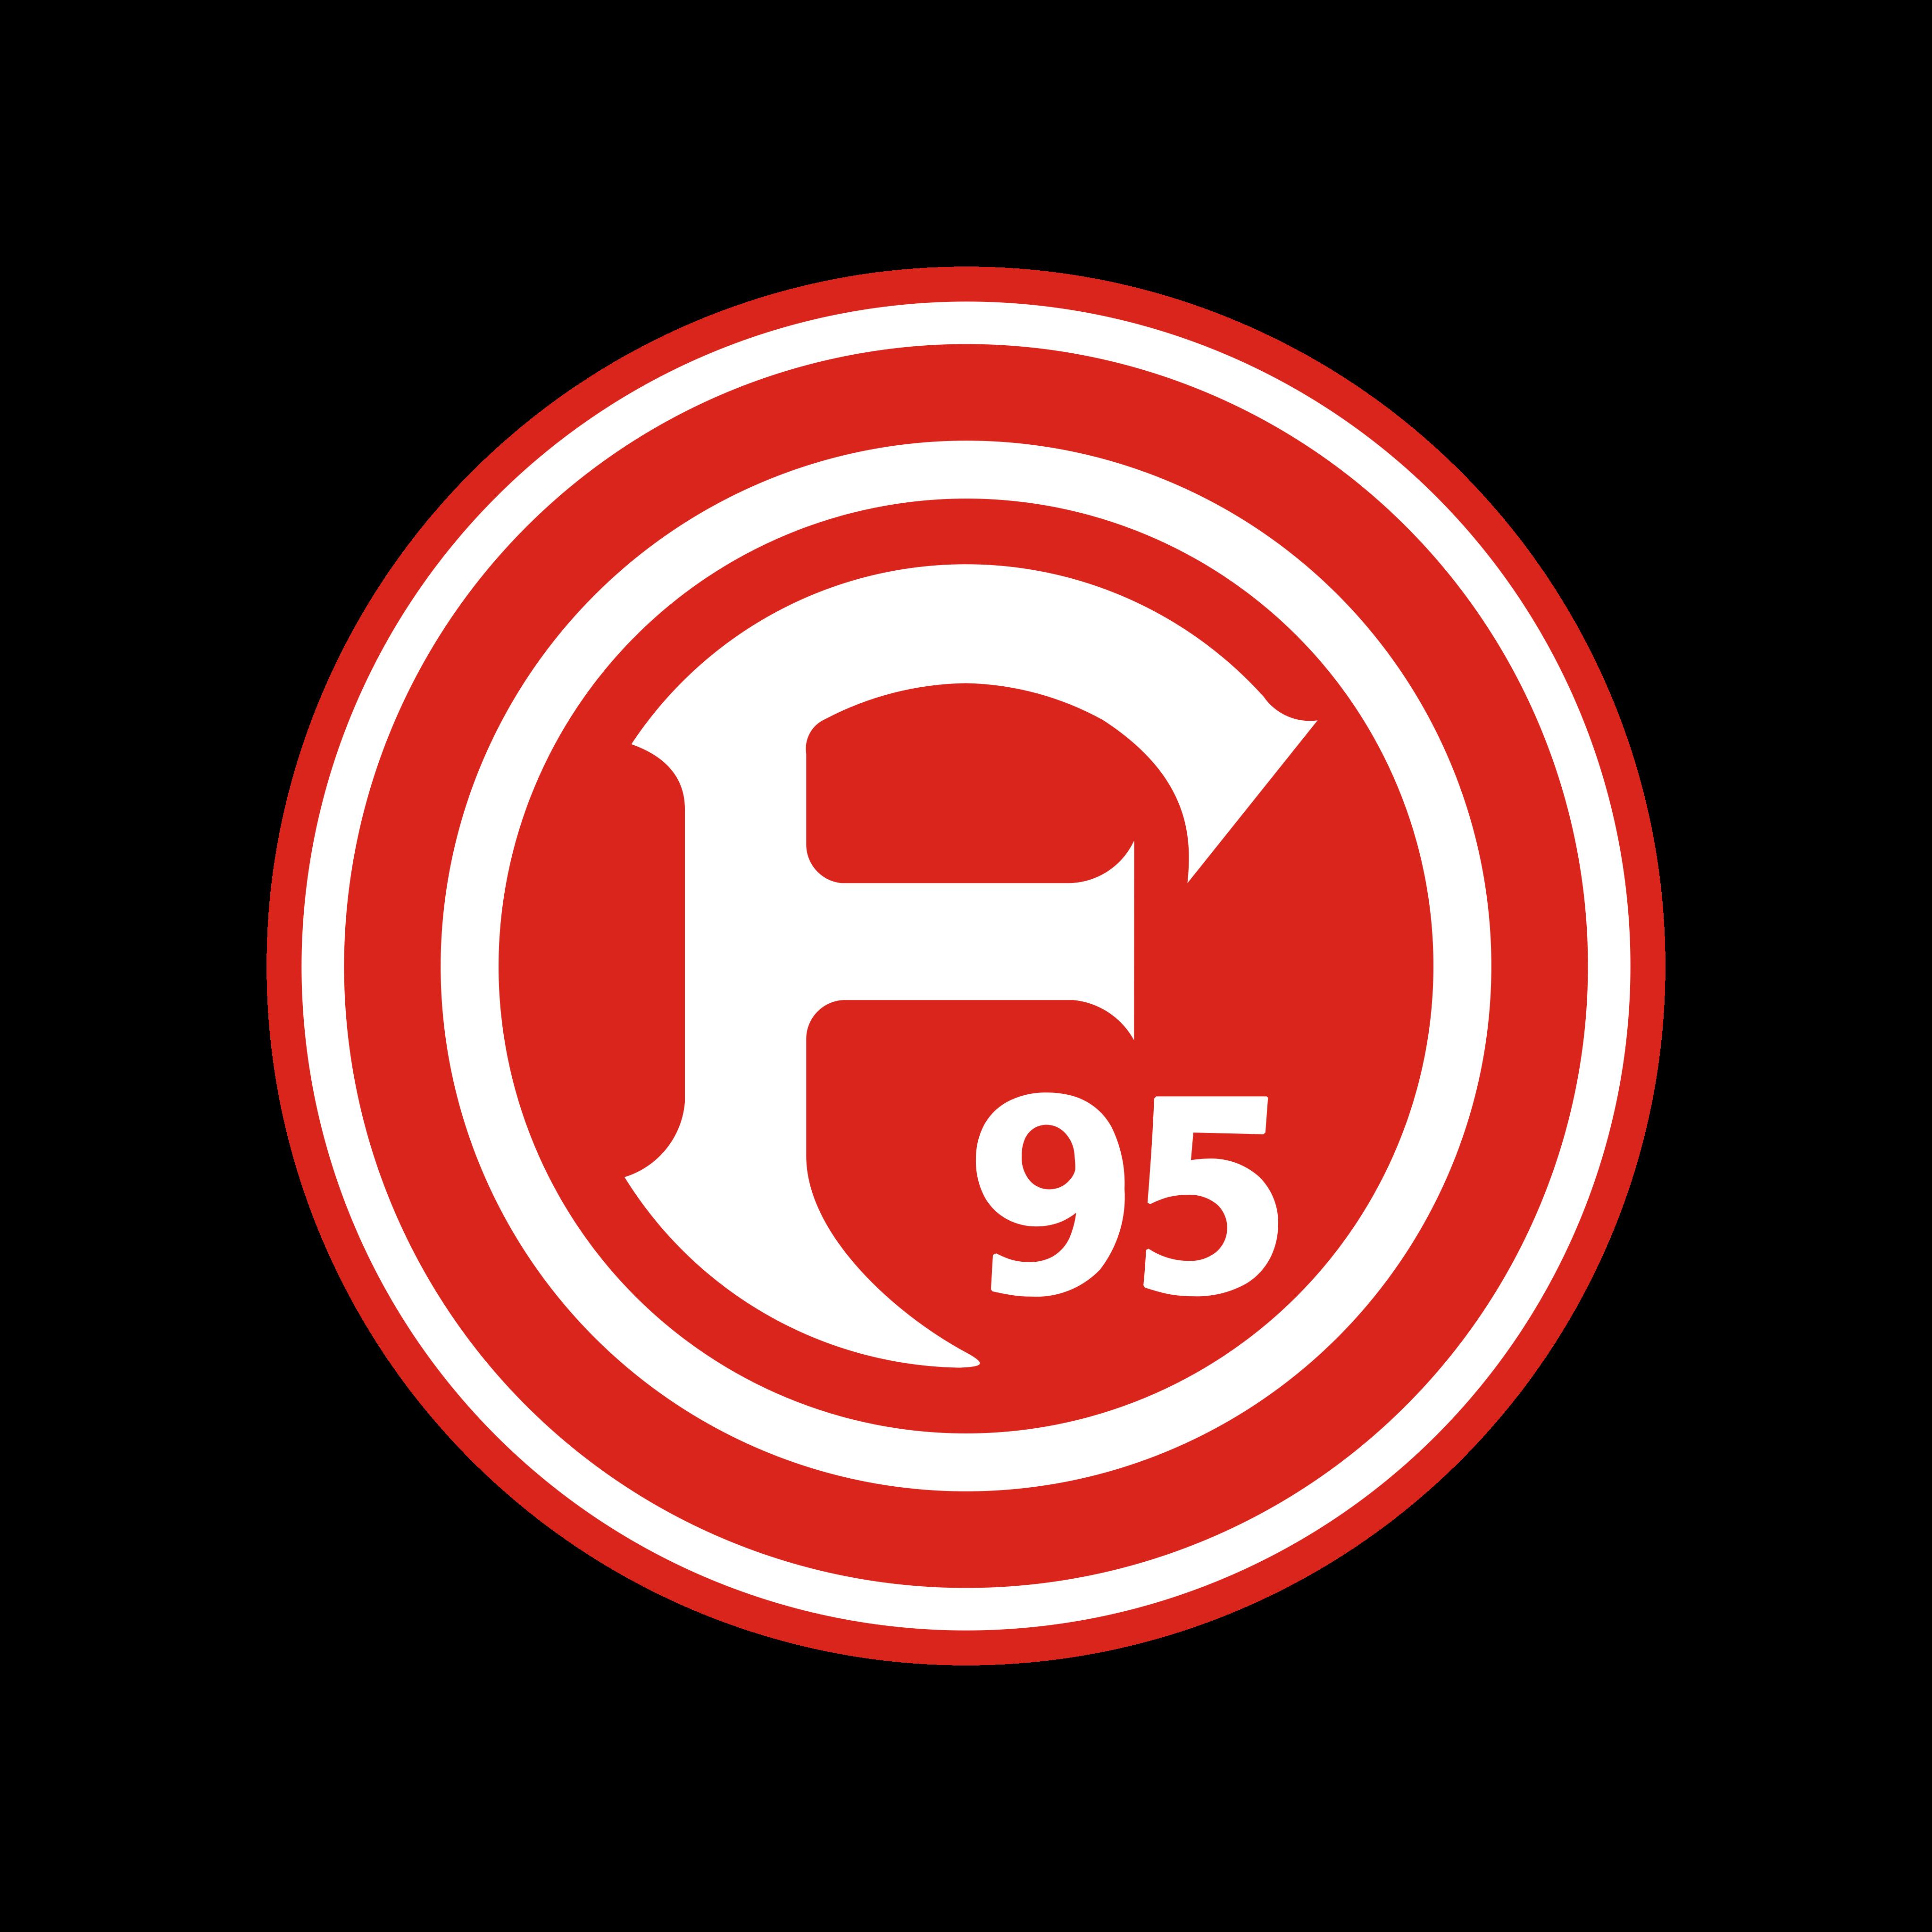 fortuna dusseldorf logo 0 - Fortuna Düsseldorf Logo